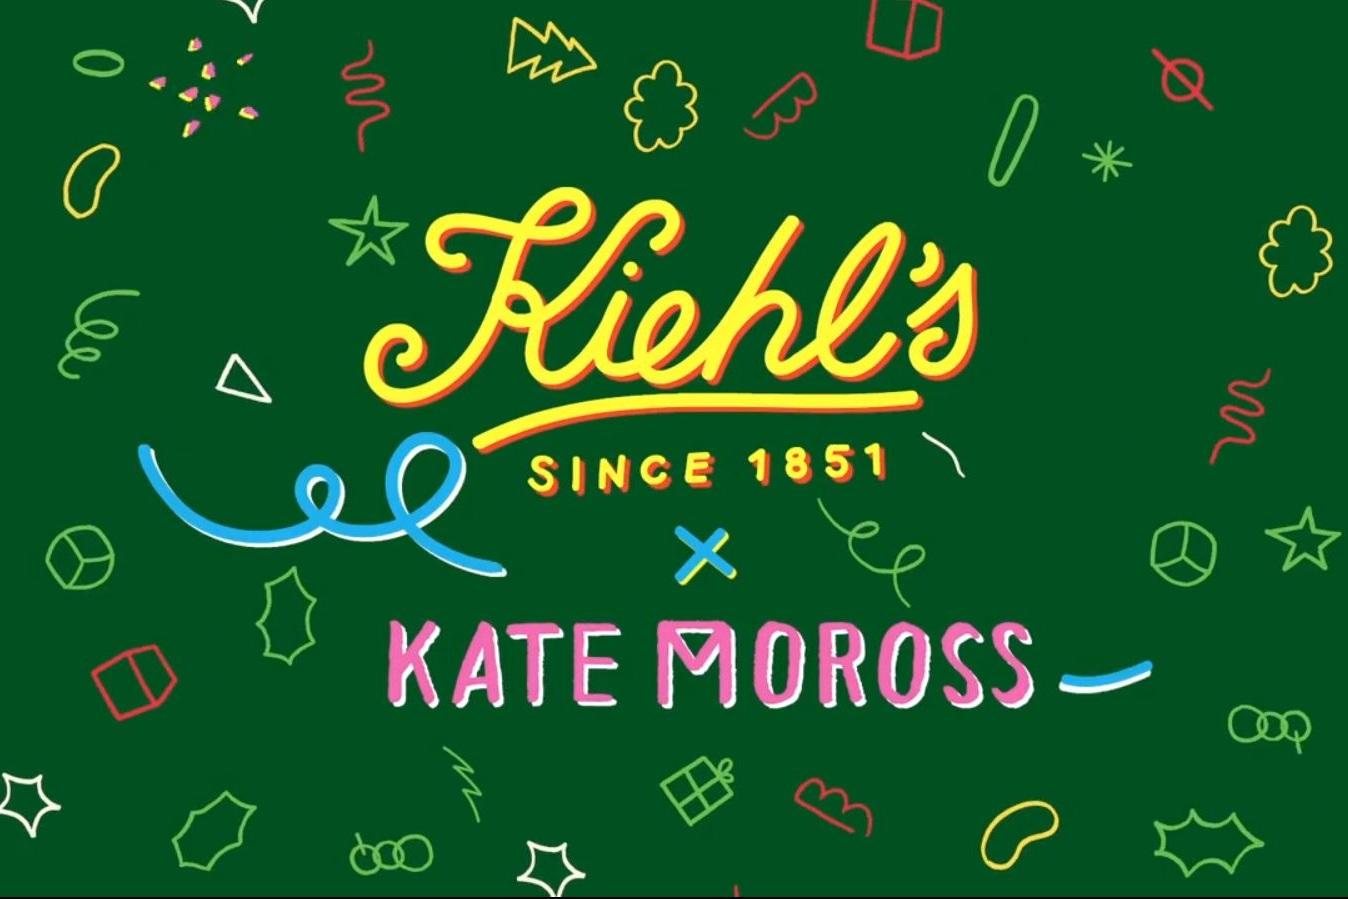 Kiehl's - Storyboard artist/Animator